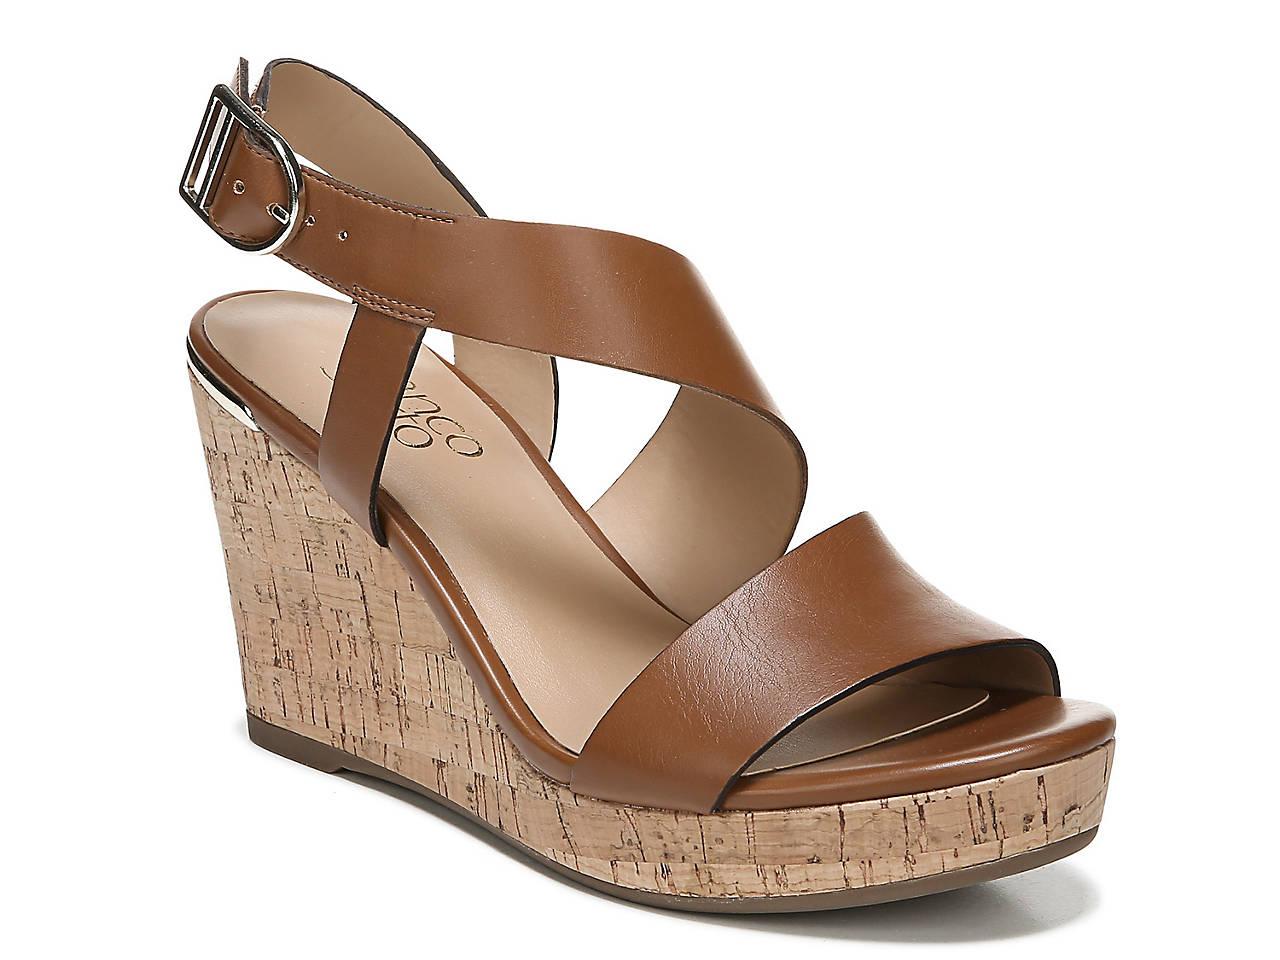 fdd3d639cf8 Franco Sarto Marabel Wedge Sandal Women s Shoes